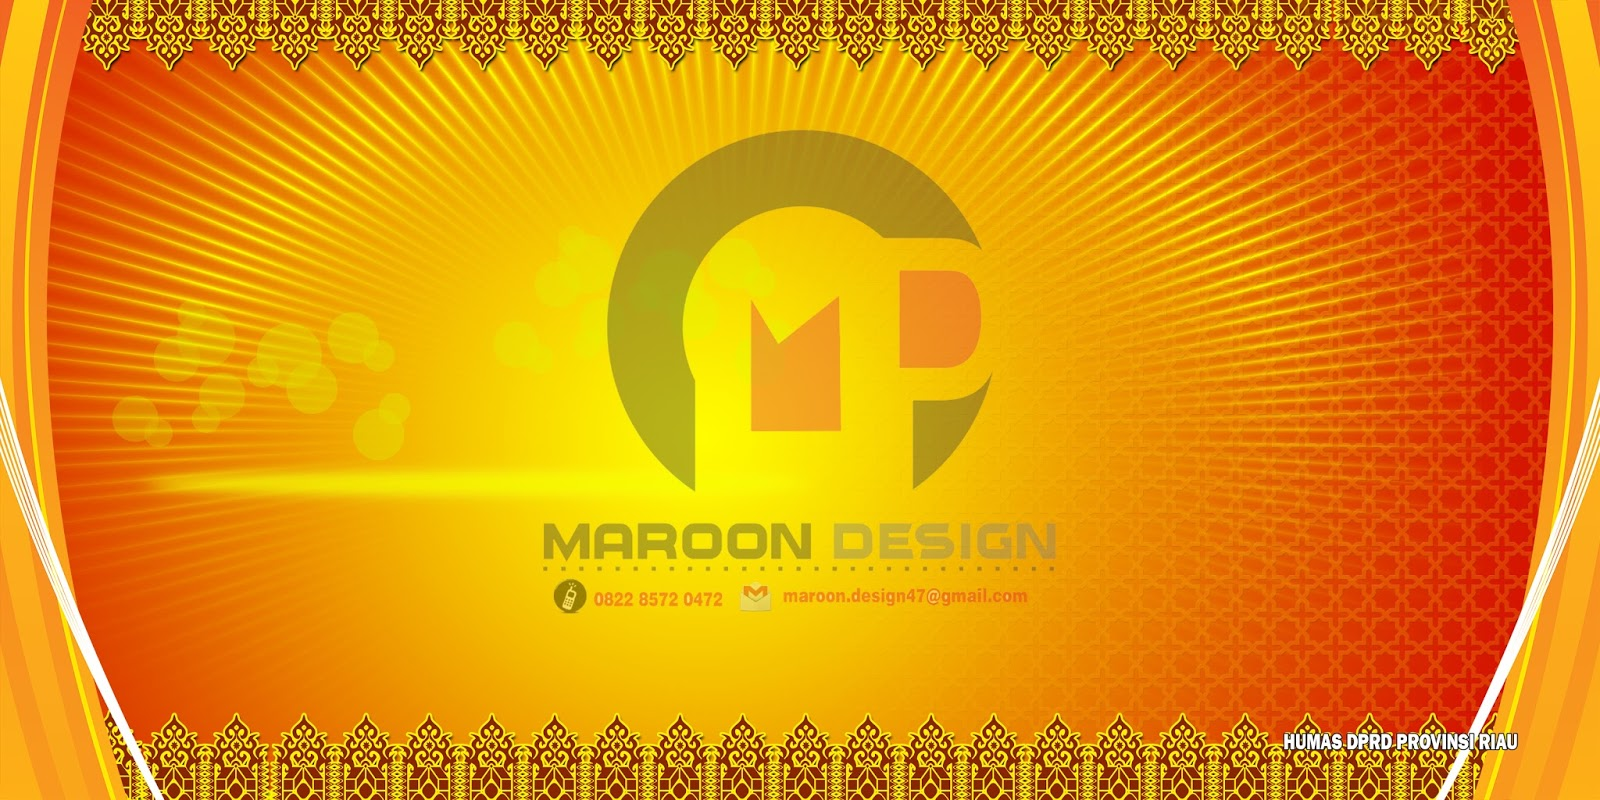 Desain Spanduk Melayu Orange 2016